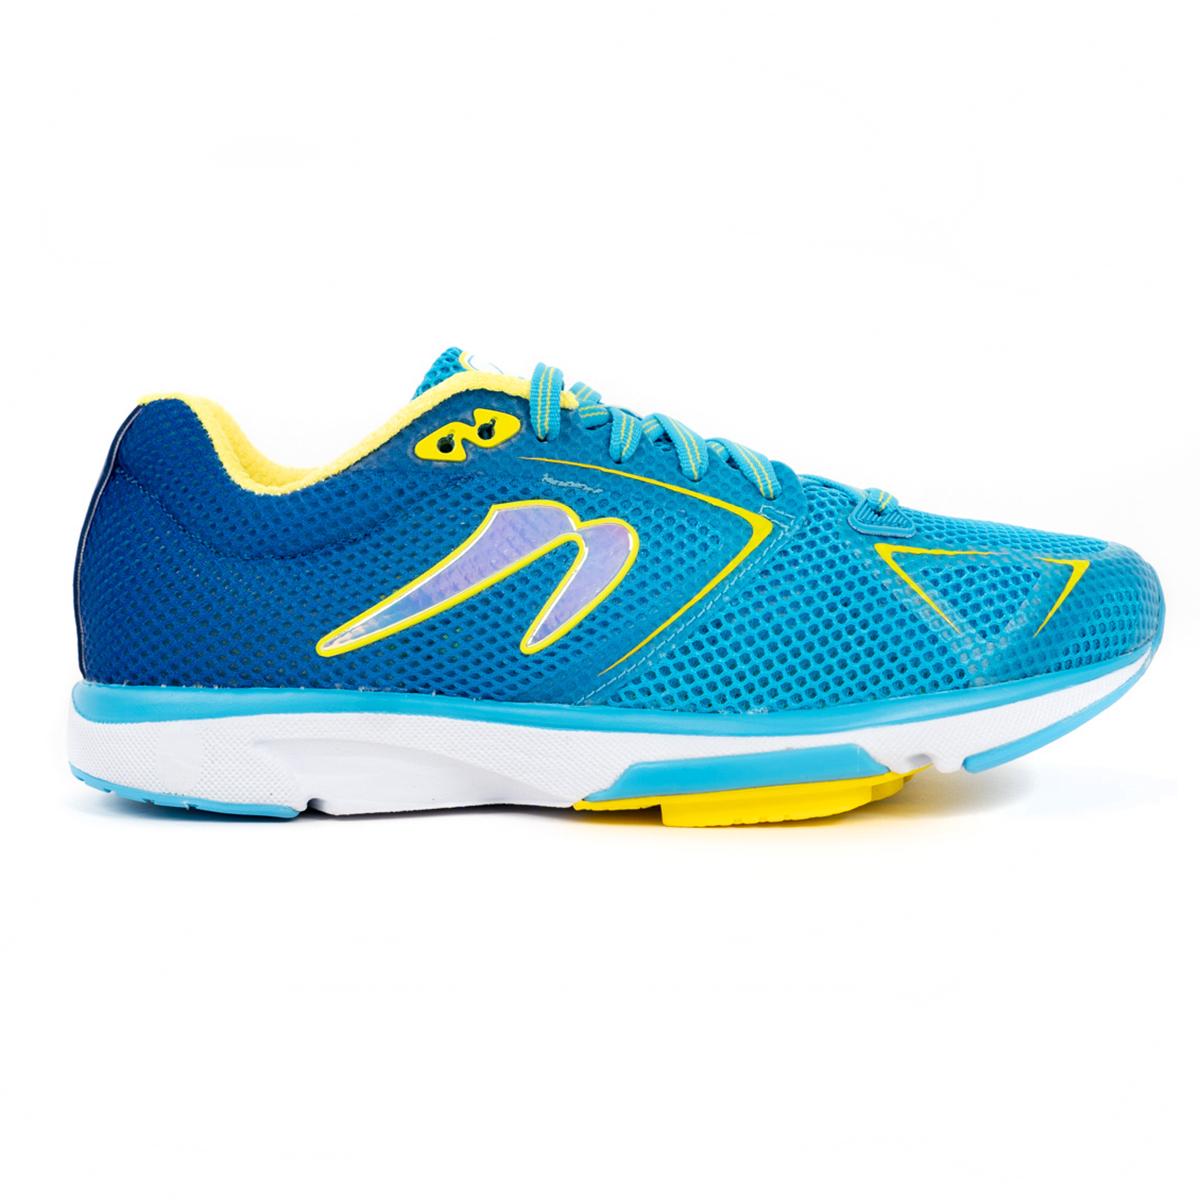 Women's Newton Distance 9 Running Shoe - Color: Laguna/Yellow (Regular Width) - Size: 5, Laguna/Yellow, large, image 1